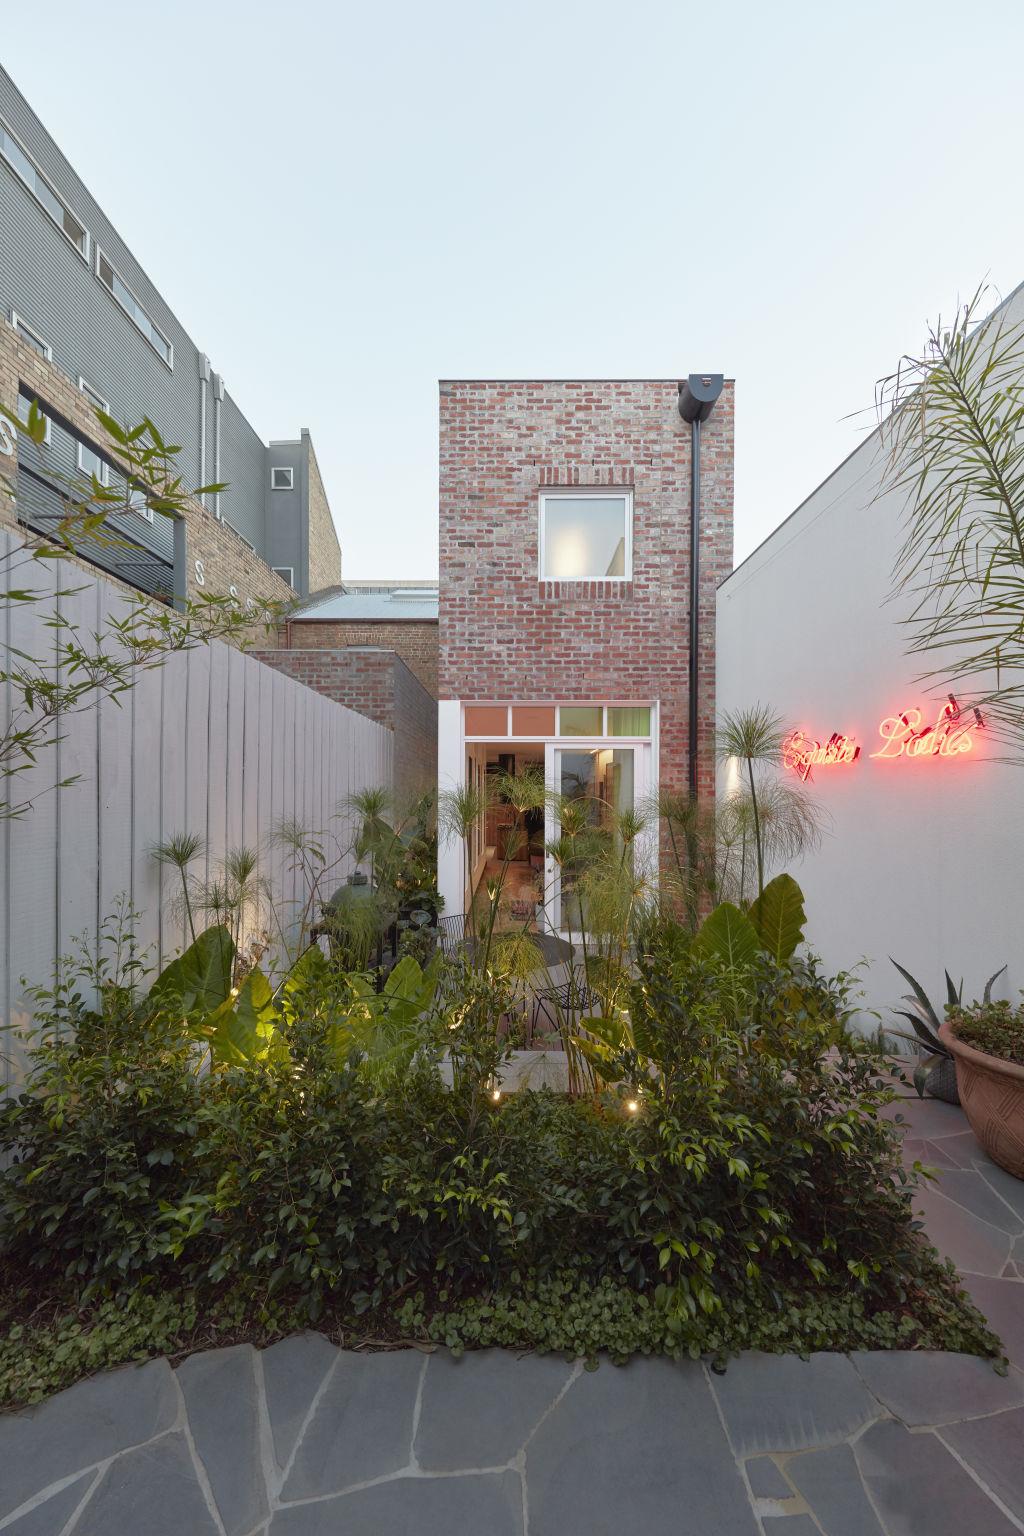 Rose Street Residence by Fieldwork NOT FOR REUSE